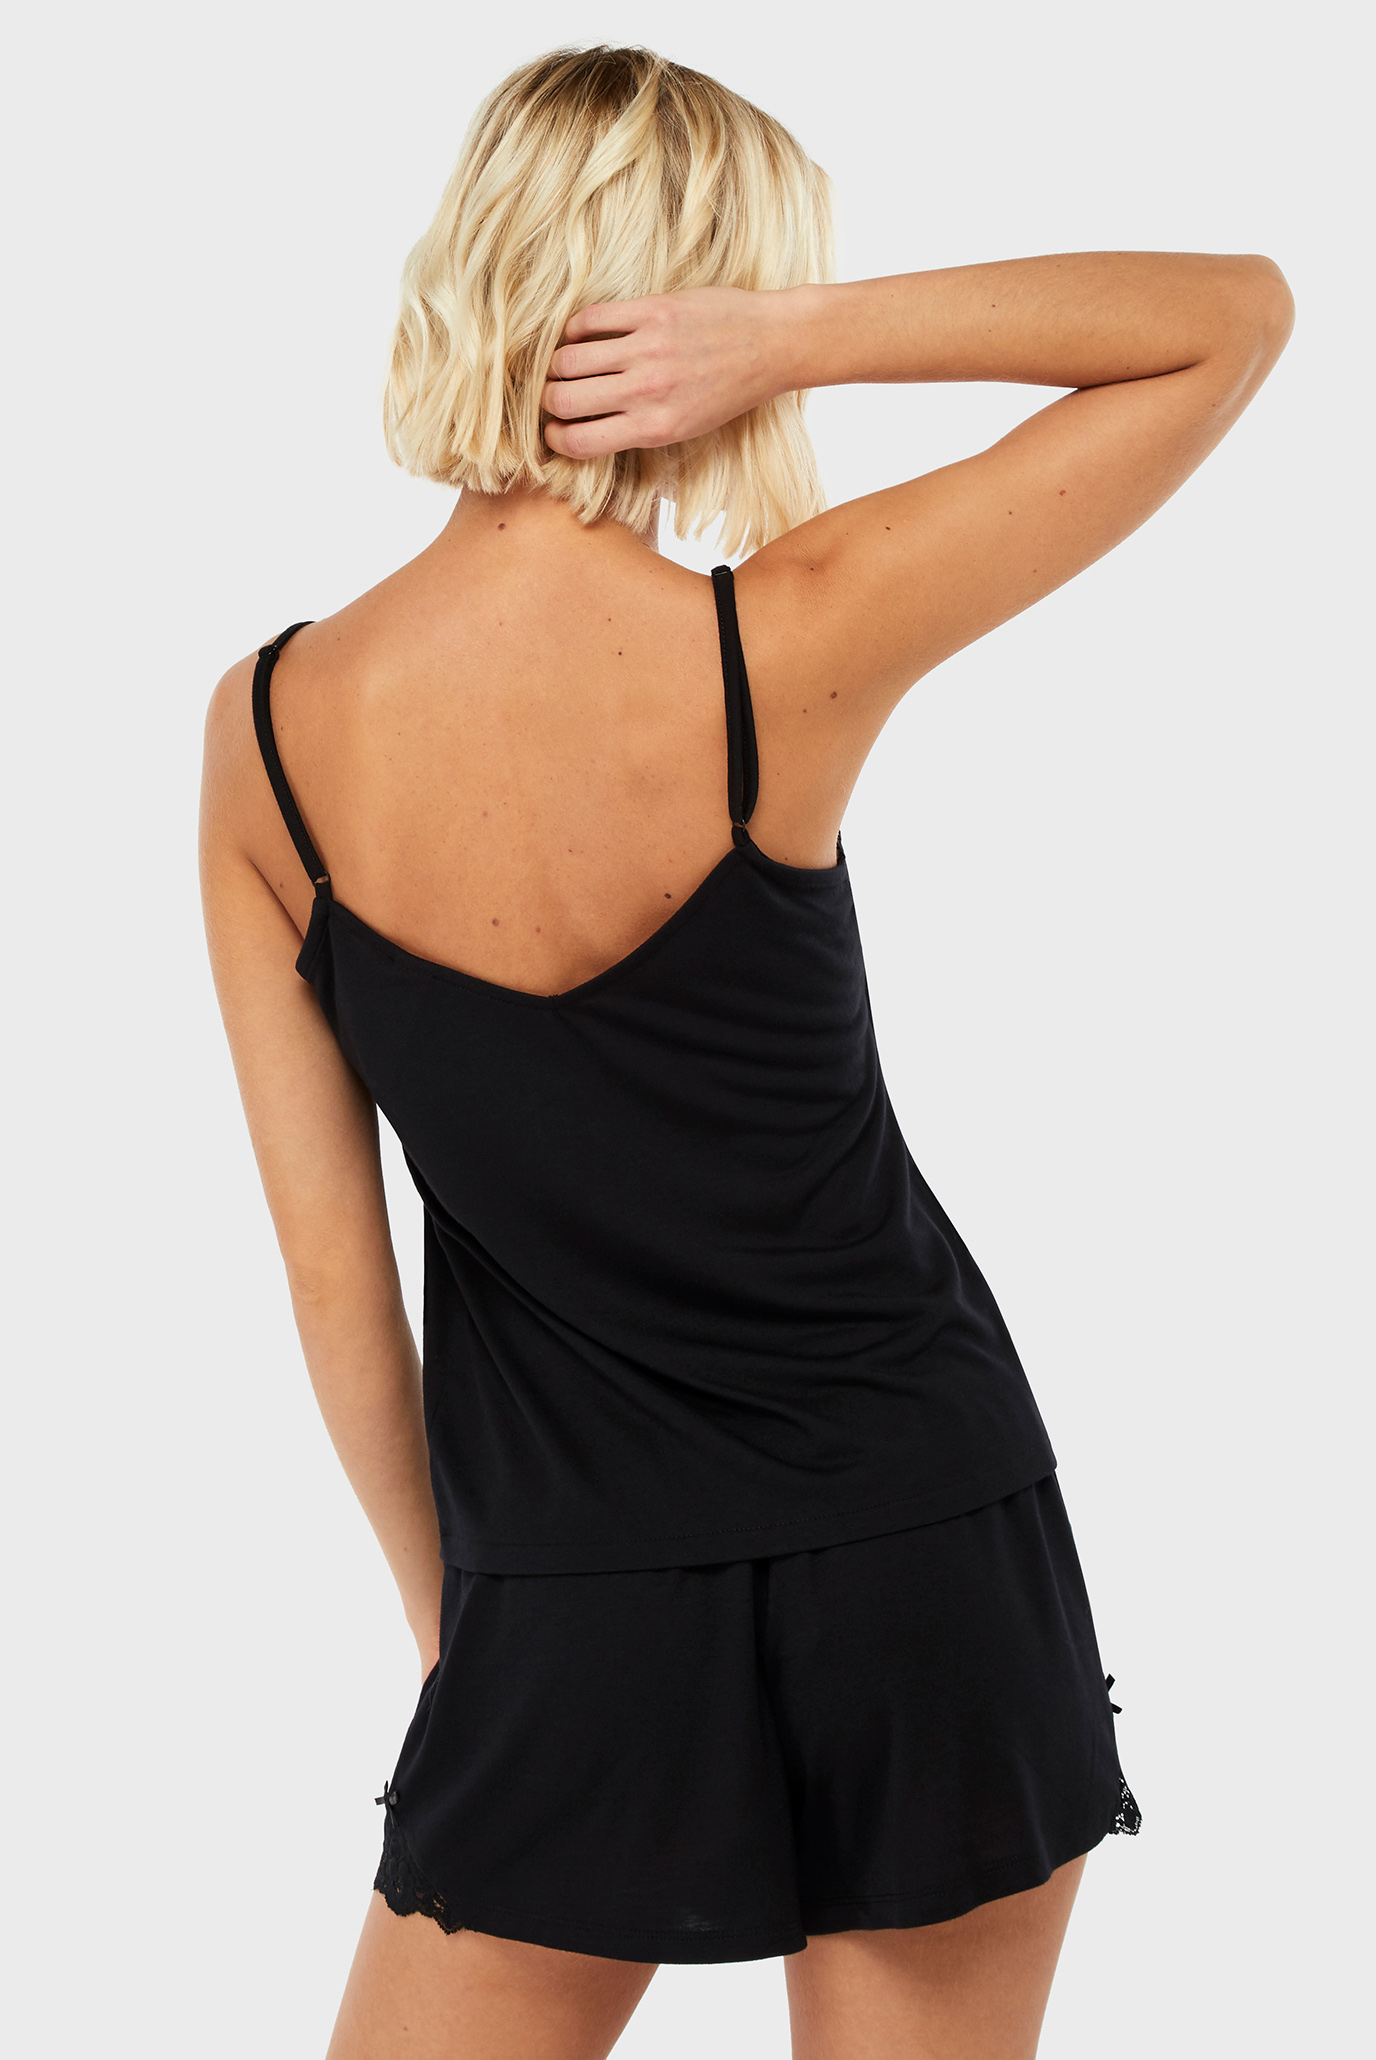 Женская черная пижама (шорты, майка) Teya Plain Vest Accessorize